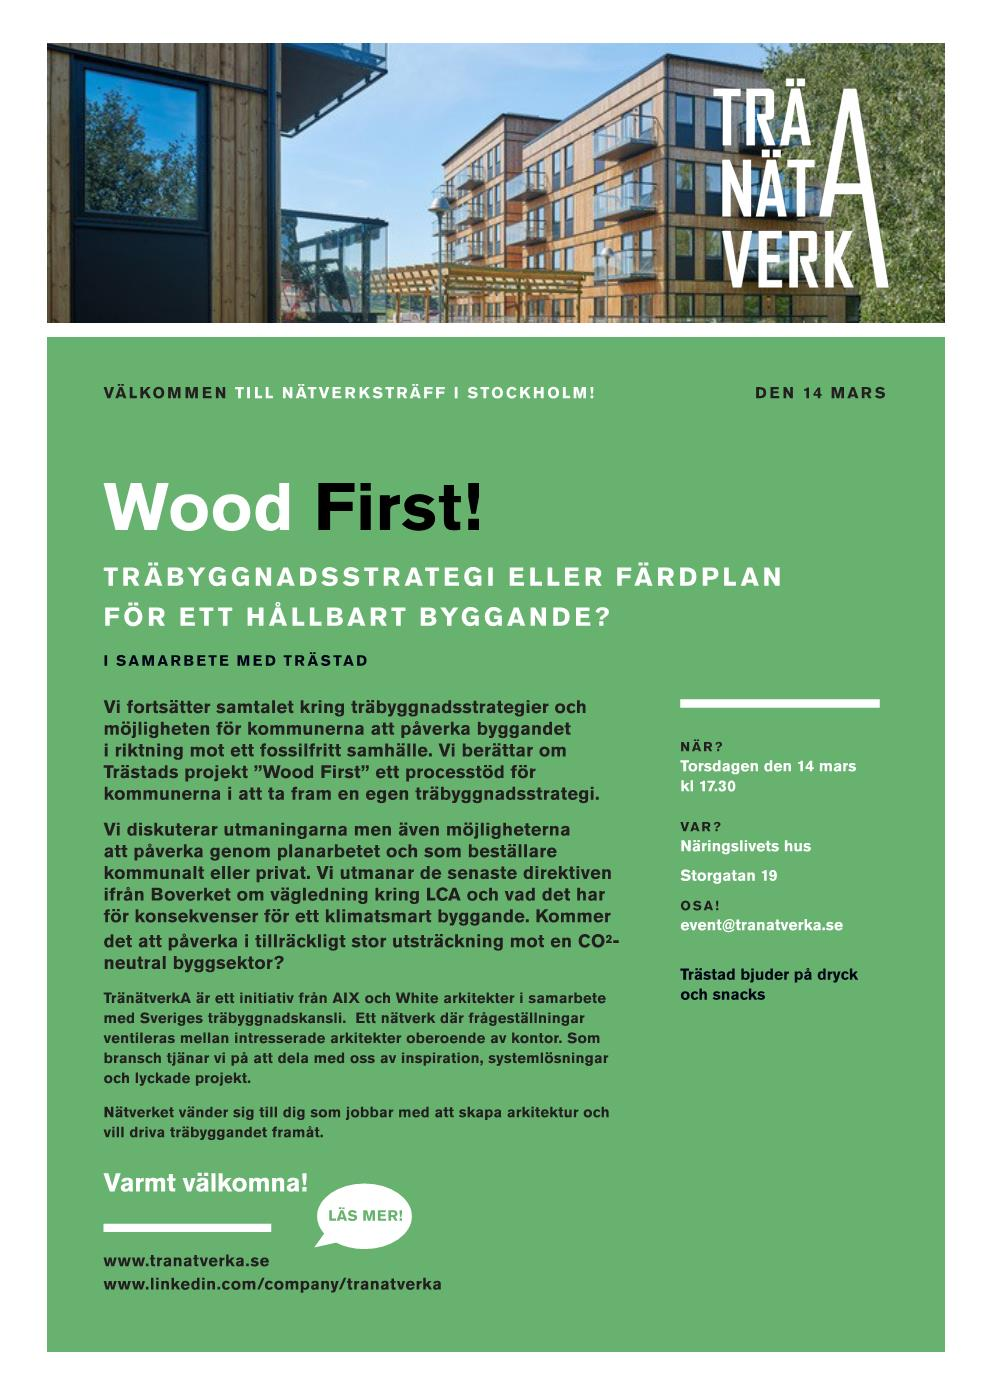 Wood First – vart leder vägen?